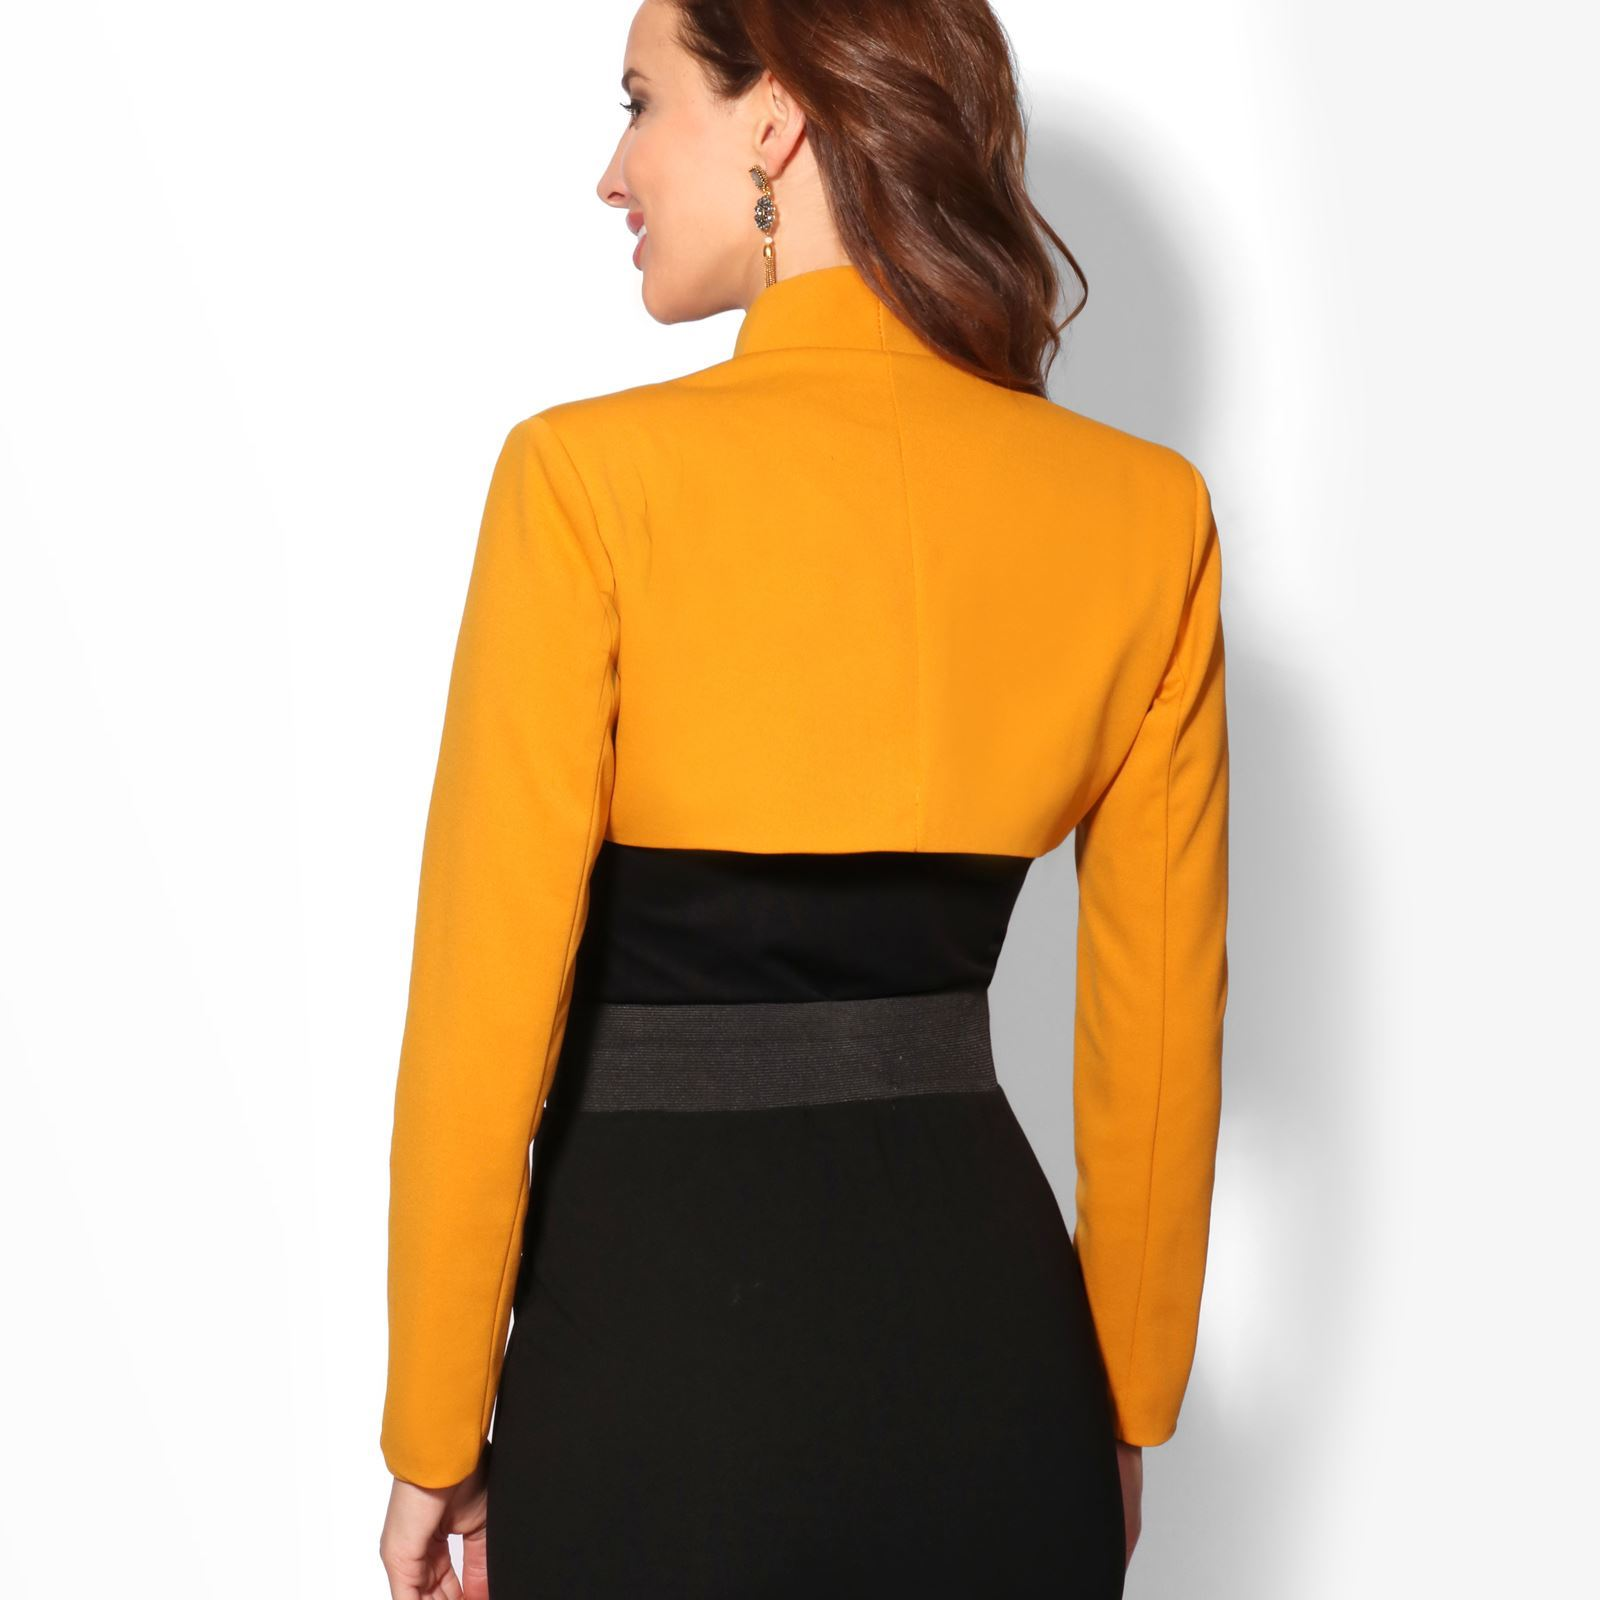 Femmes-Veste-Courte-Bolero-Blazer-Jacket-Manche-3-4-Gilet-Cardigan-Cache-Epaule miniature 7